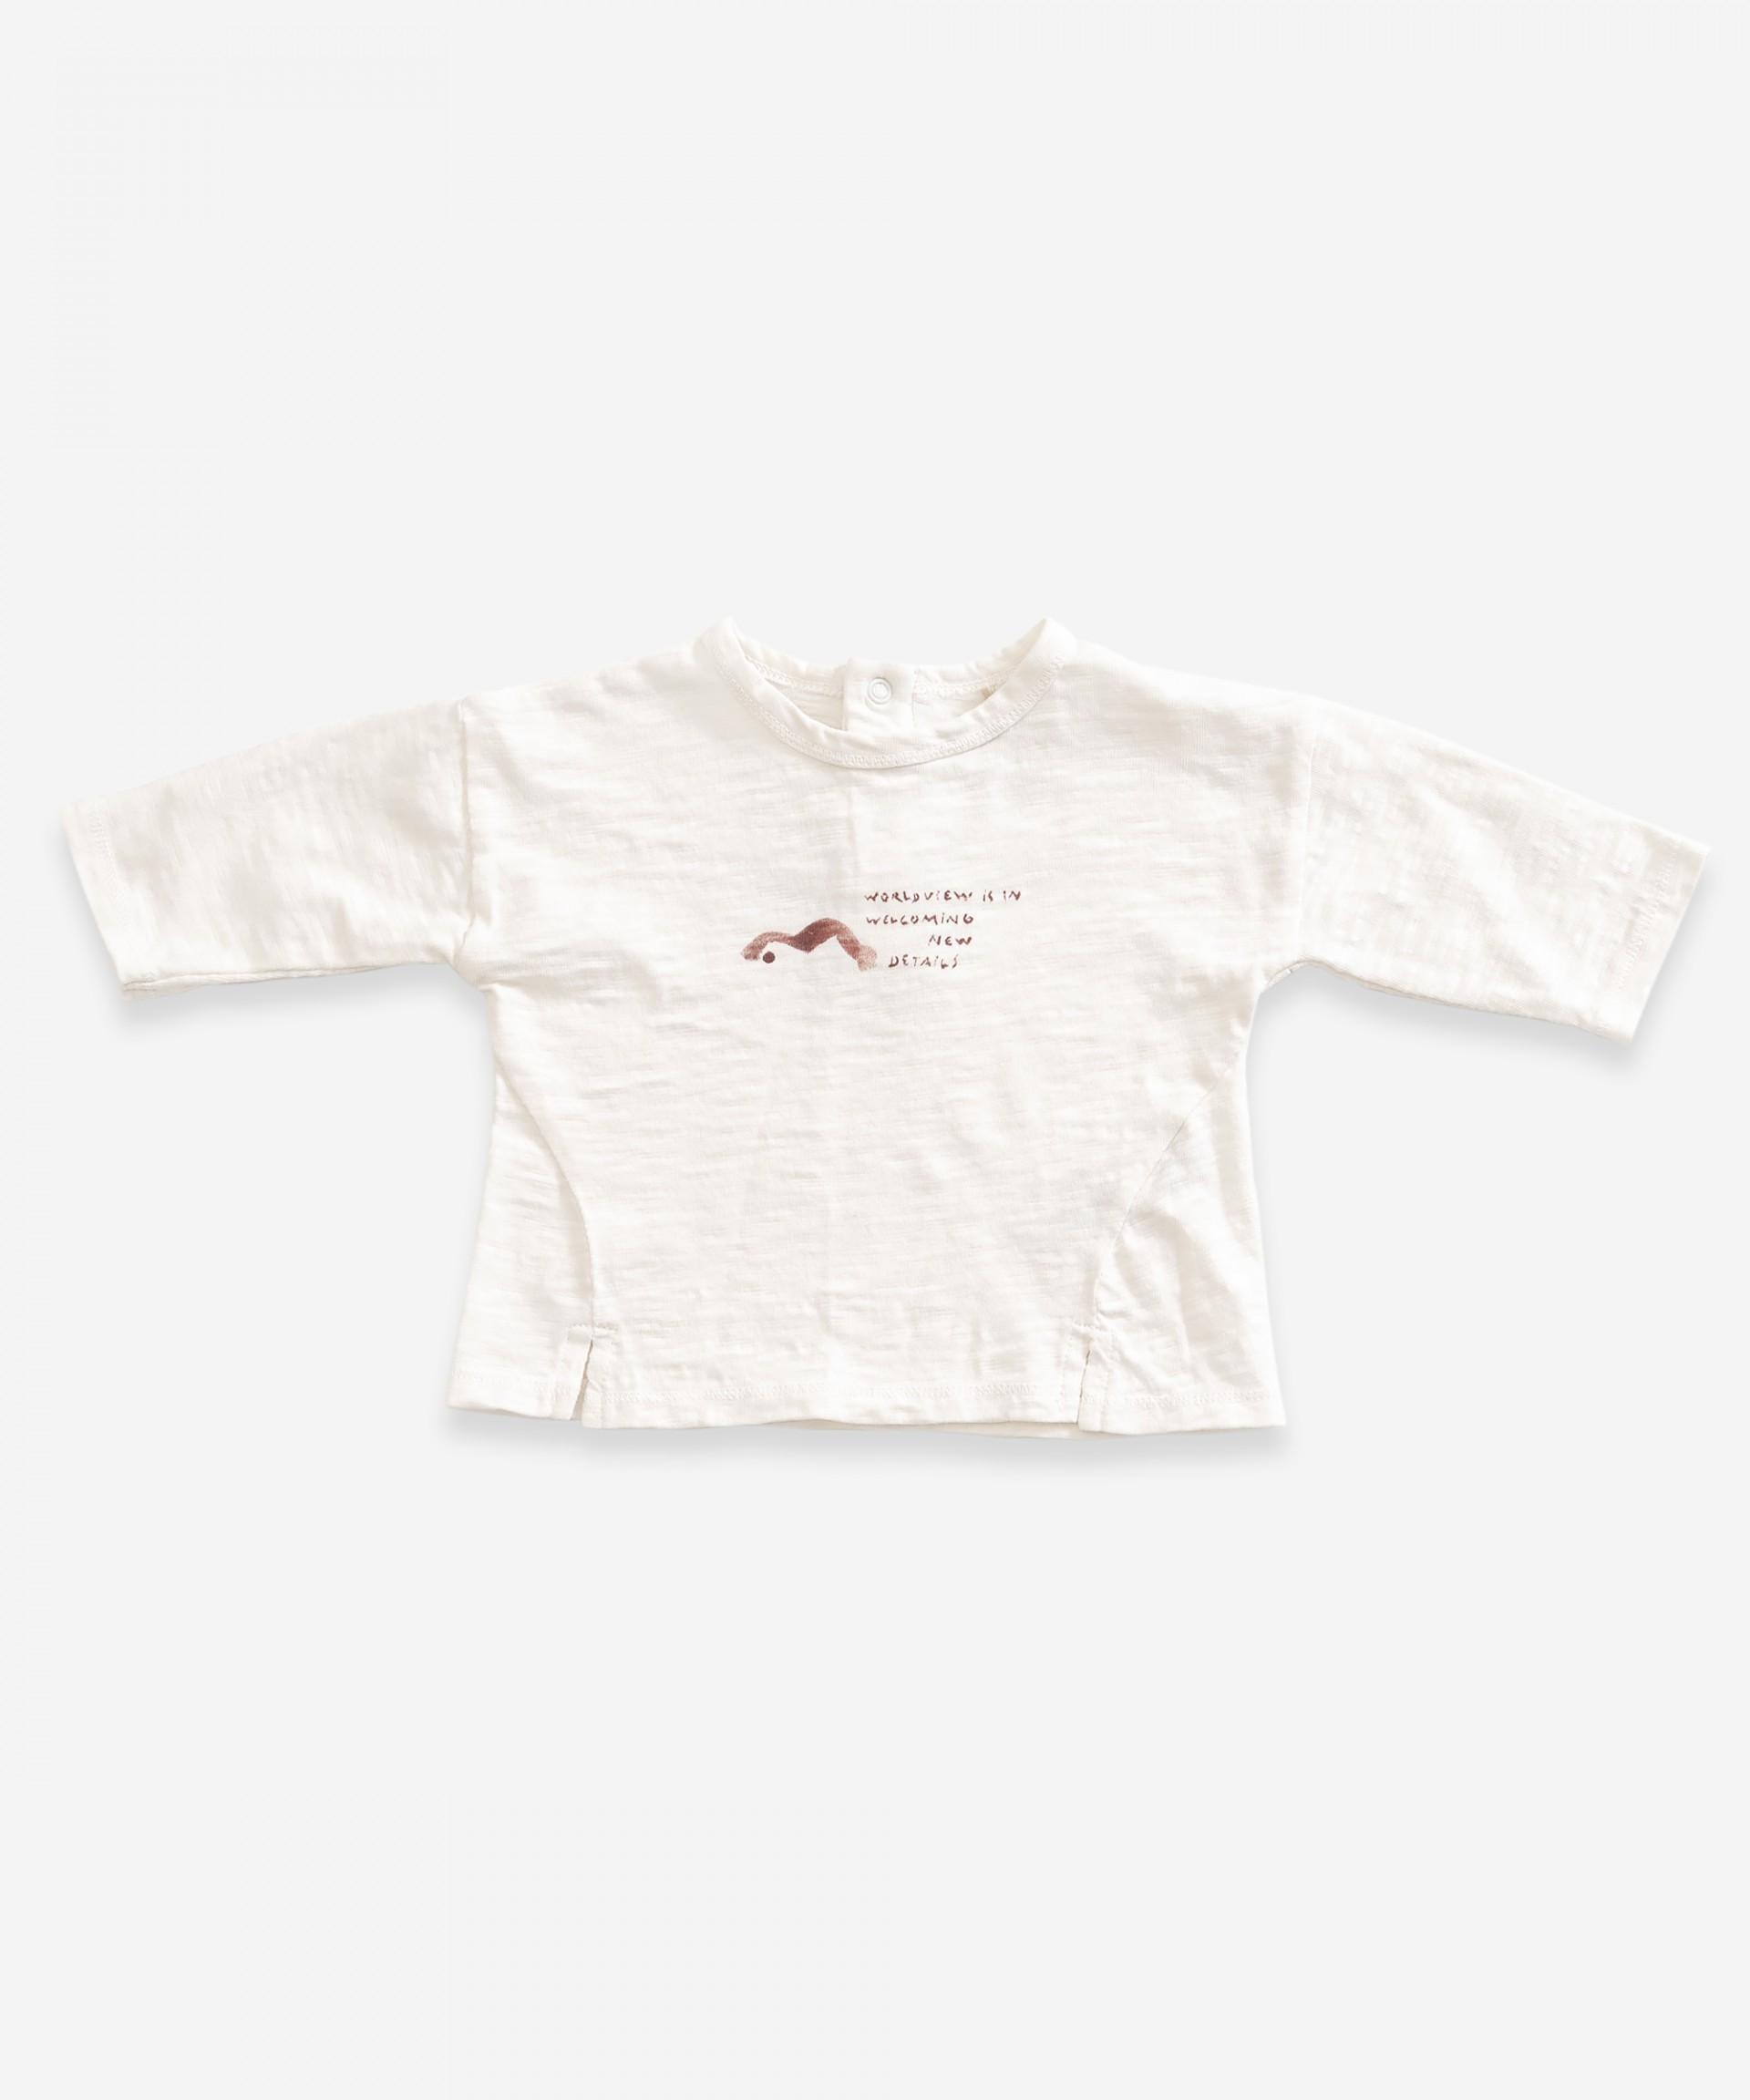 T-shirt a maniche lunghe in cotone biologico | Weaving